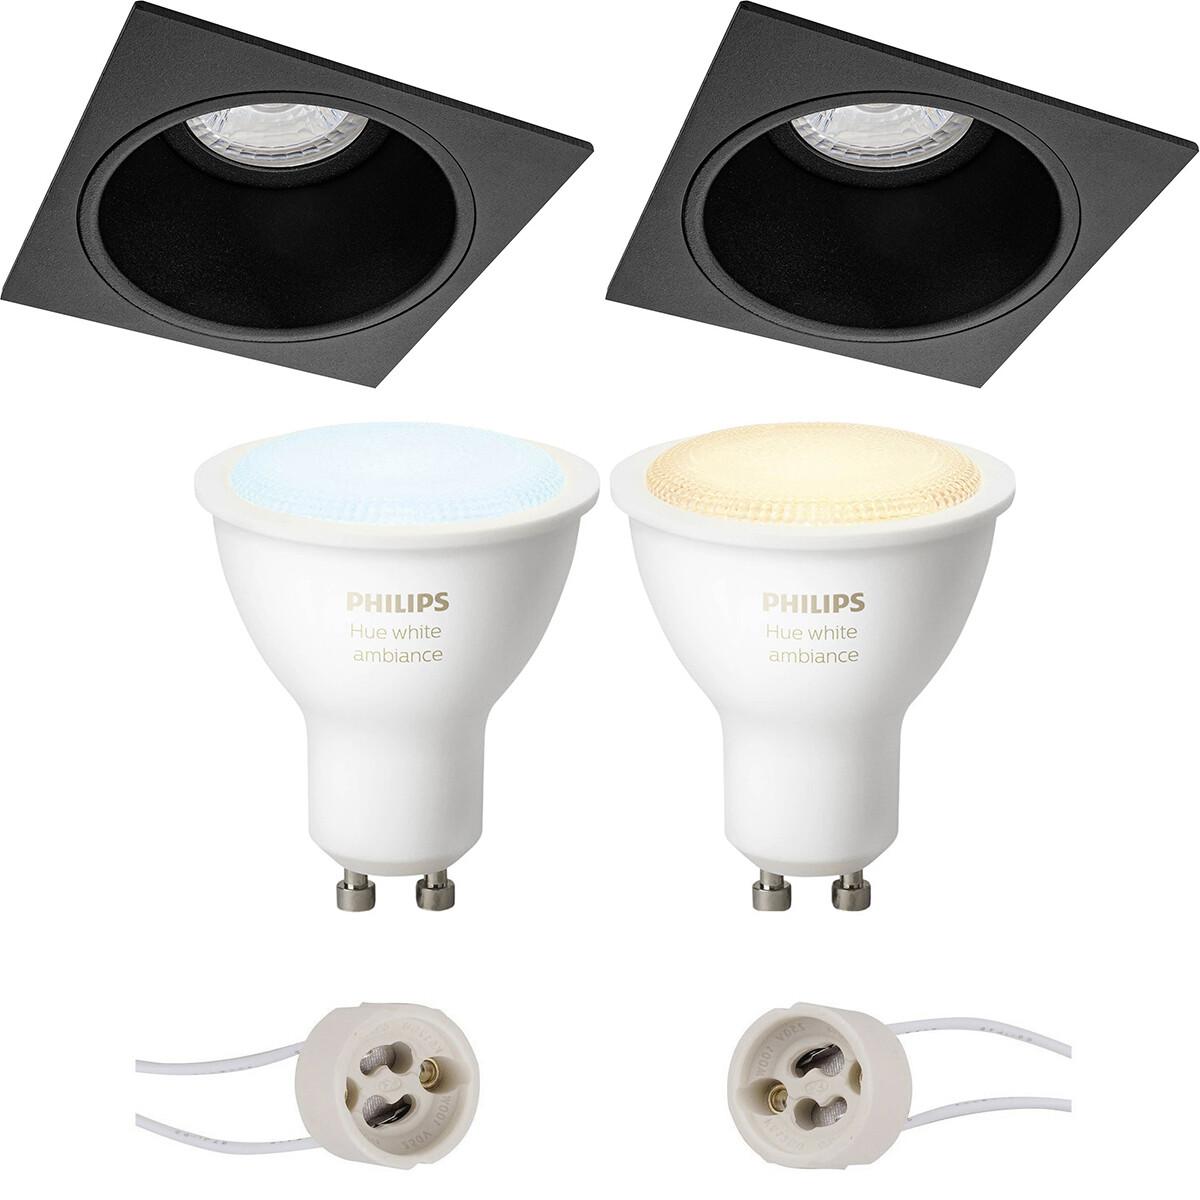 Pragmi Minko Pro - Inbouw Vierkant - Mat Zwart - Verdiept - 90mm - Philips Hue - LED Spot Set GU10 -